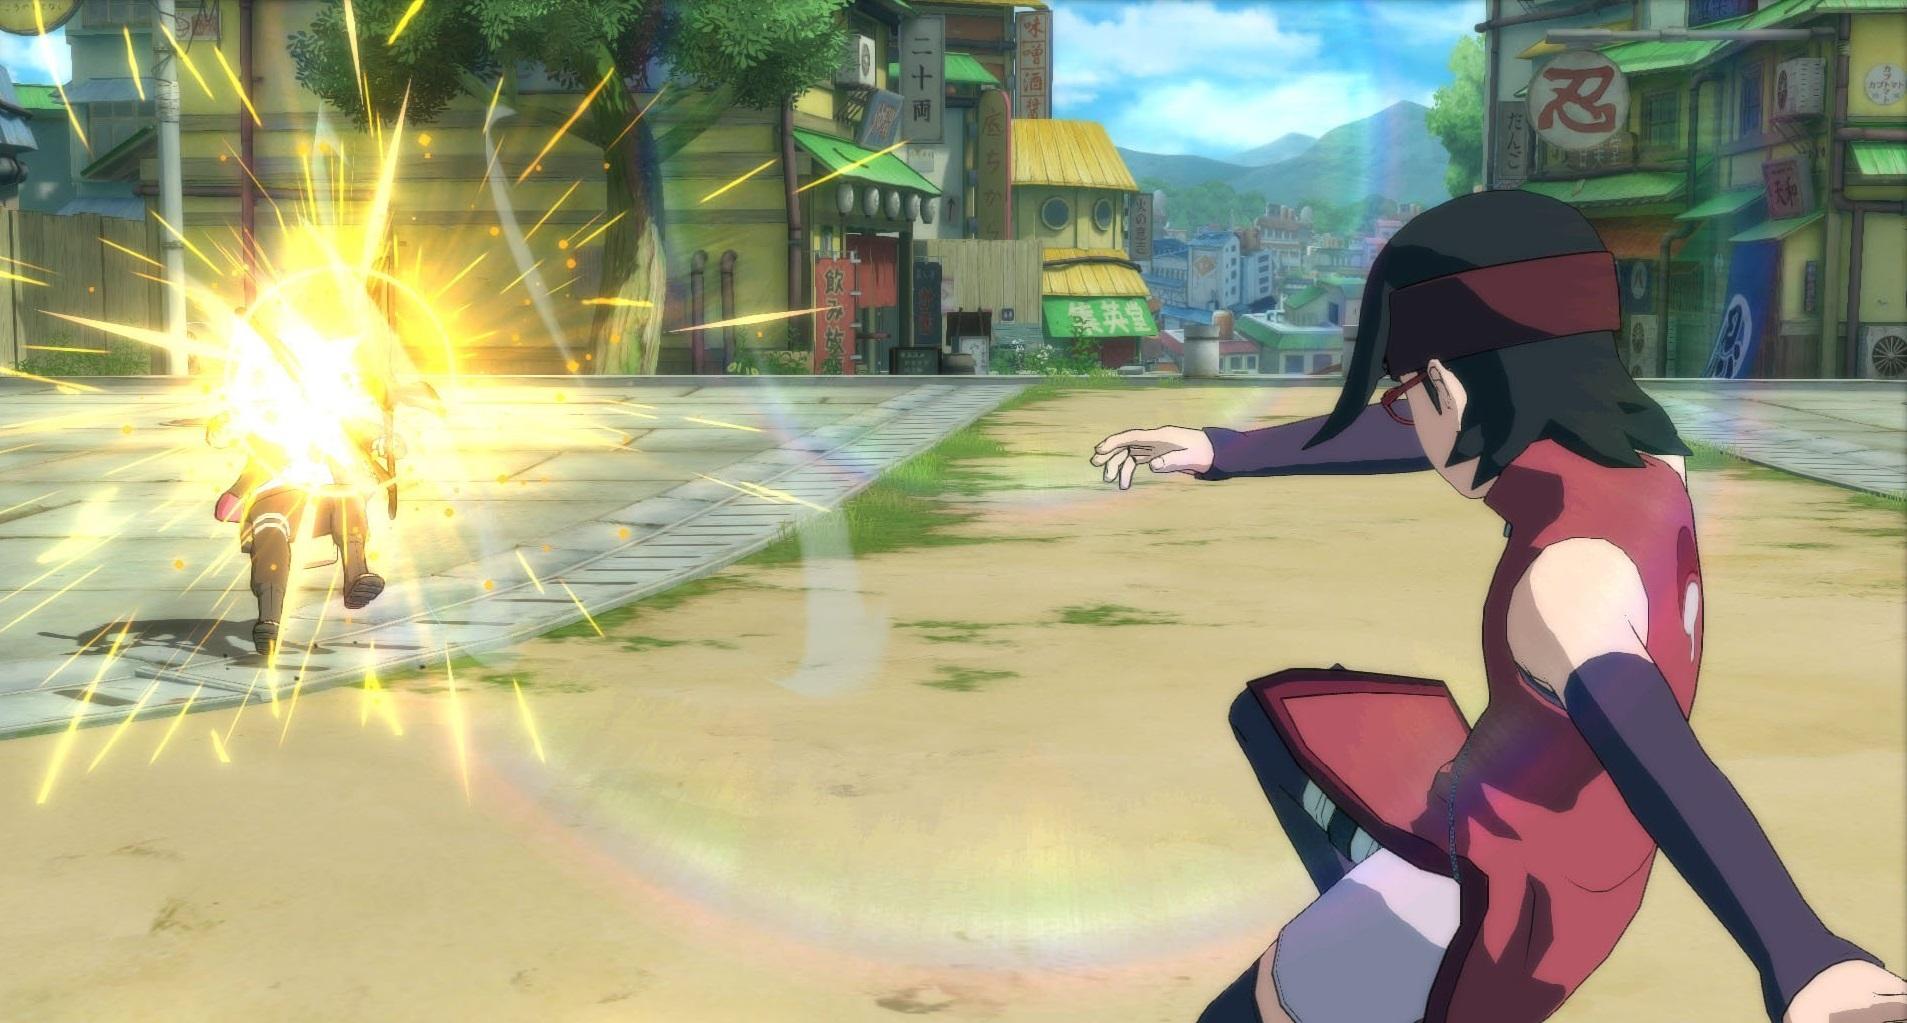 Naruto-Storm-21 Naruto Storm 4 Yeni Gameplay Ekran Görüntüleri